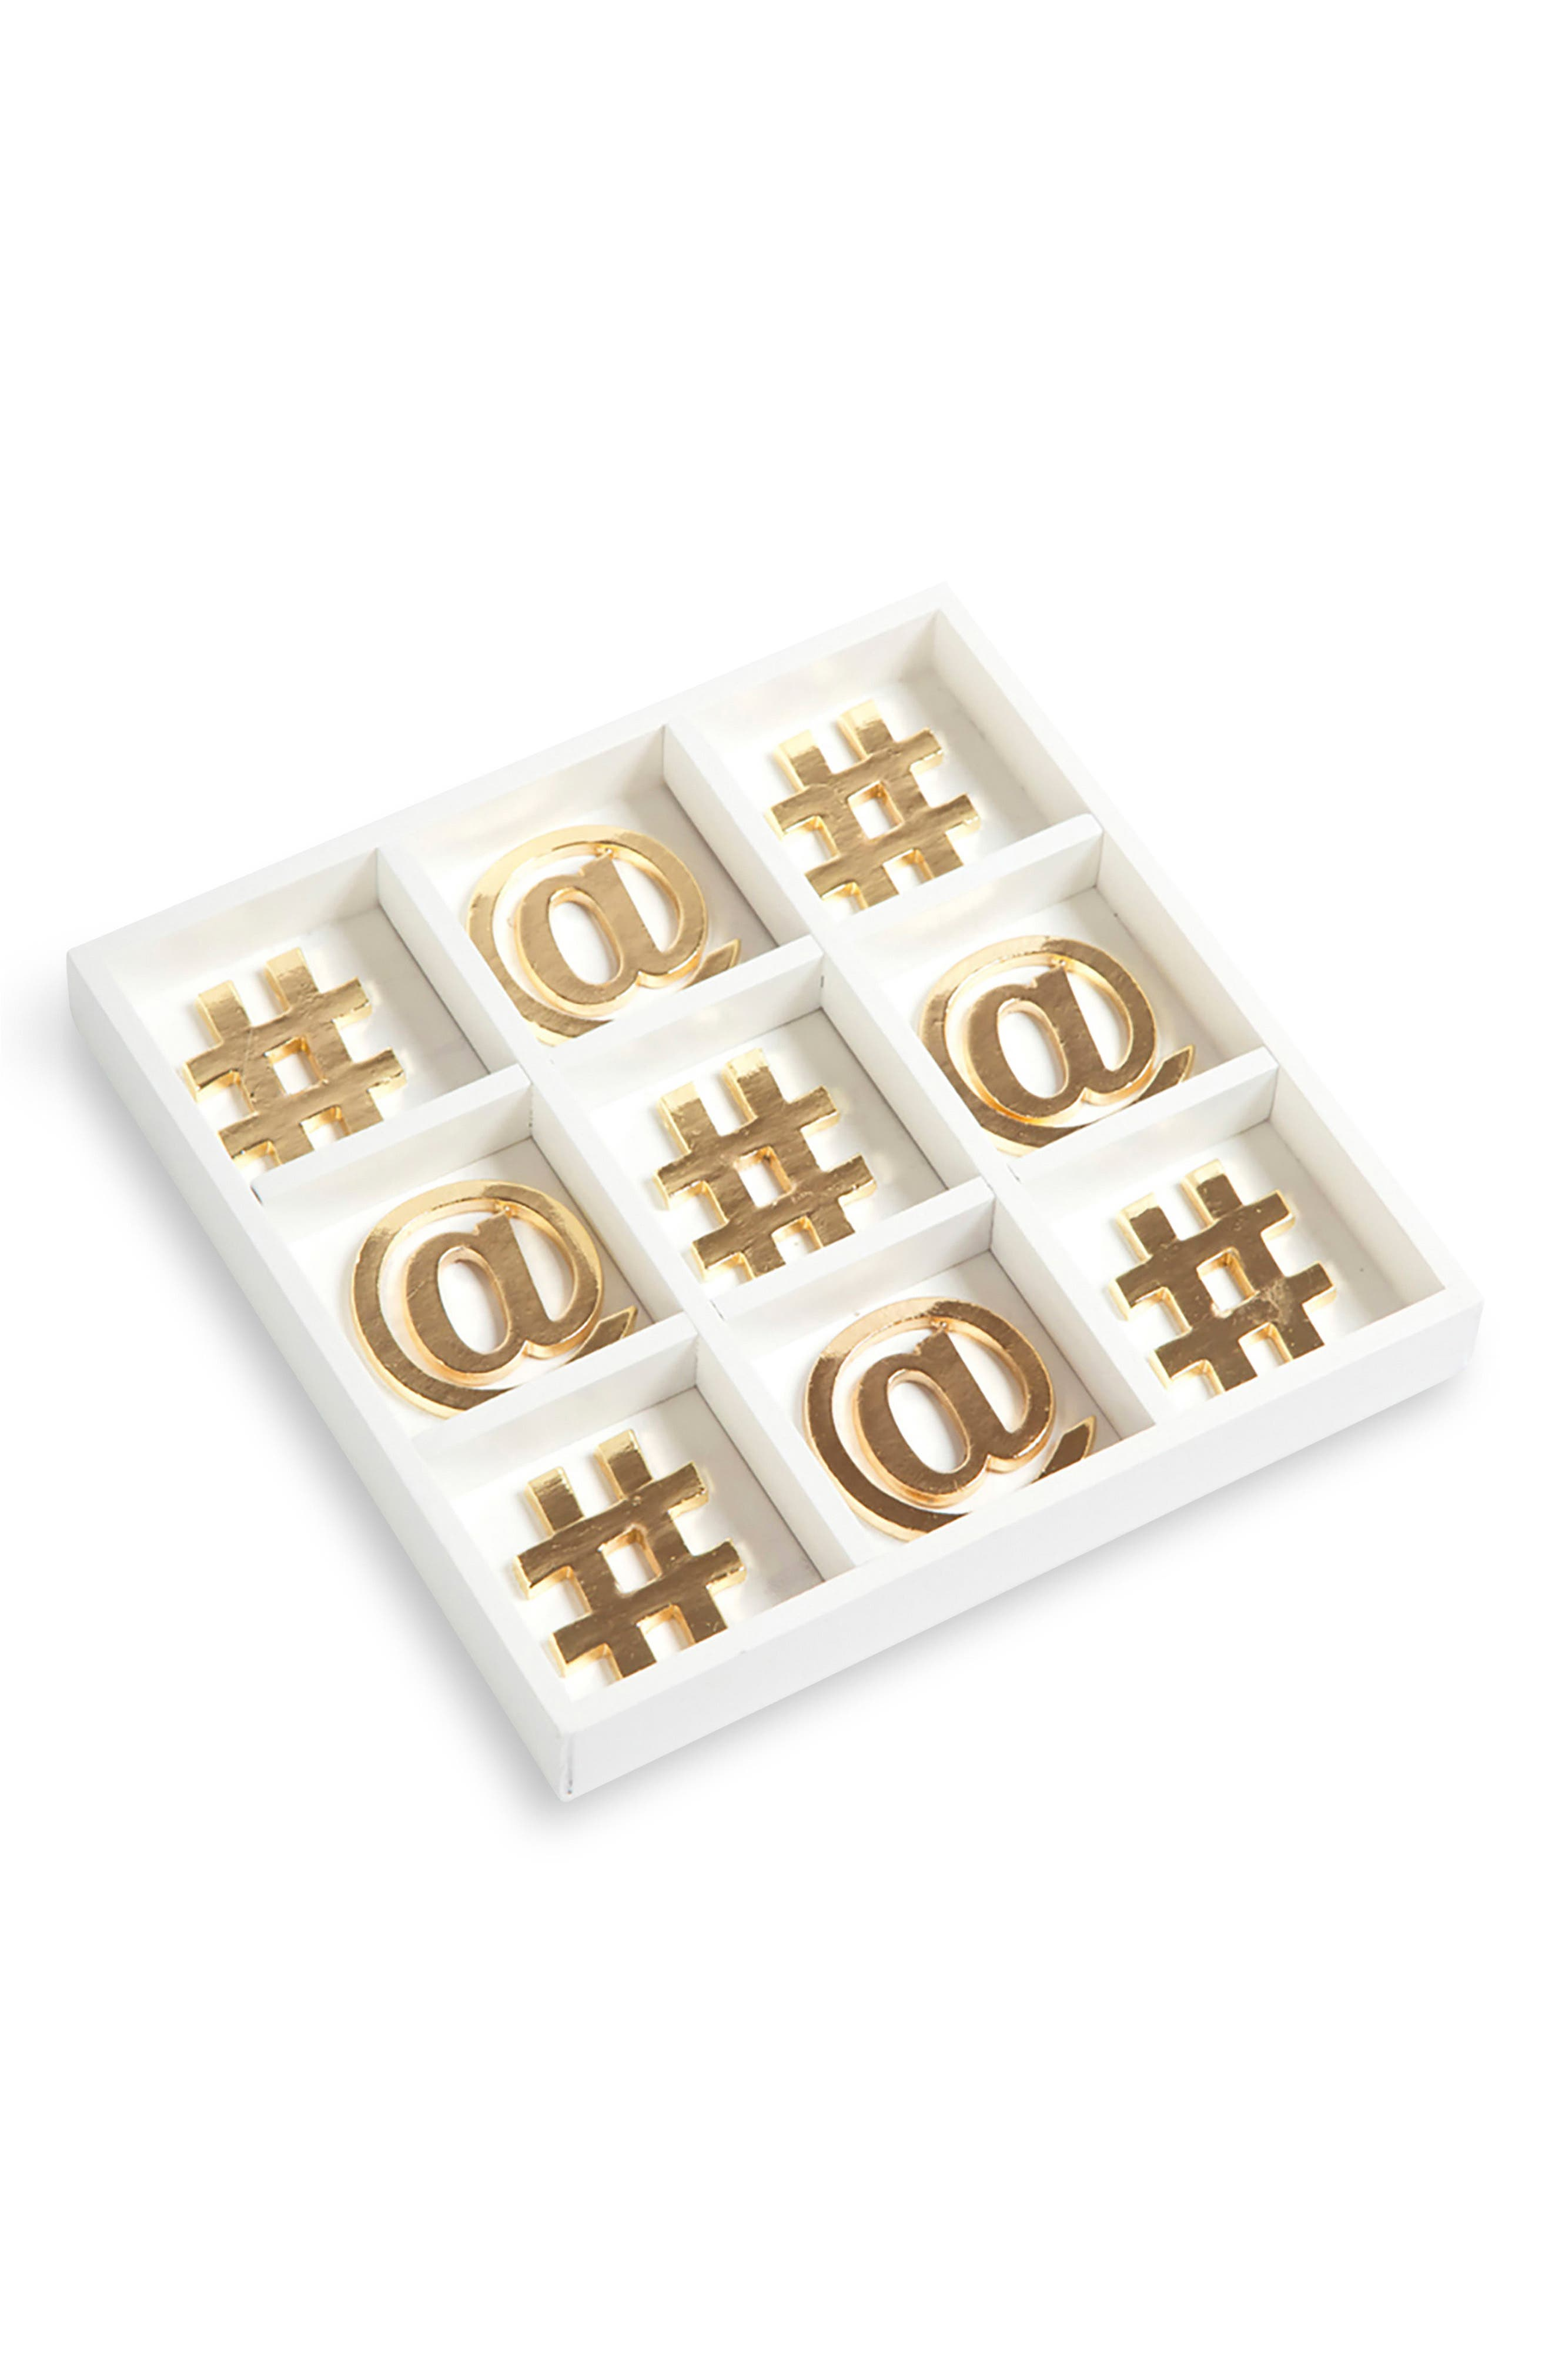 Gold Tic Tac Toe Set,                         Main,                         color, White/ Gold